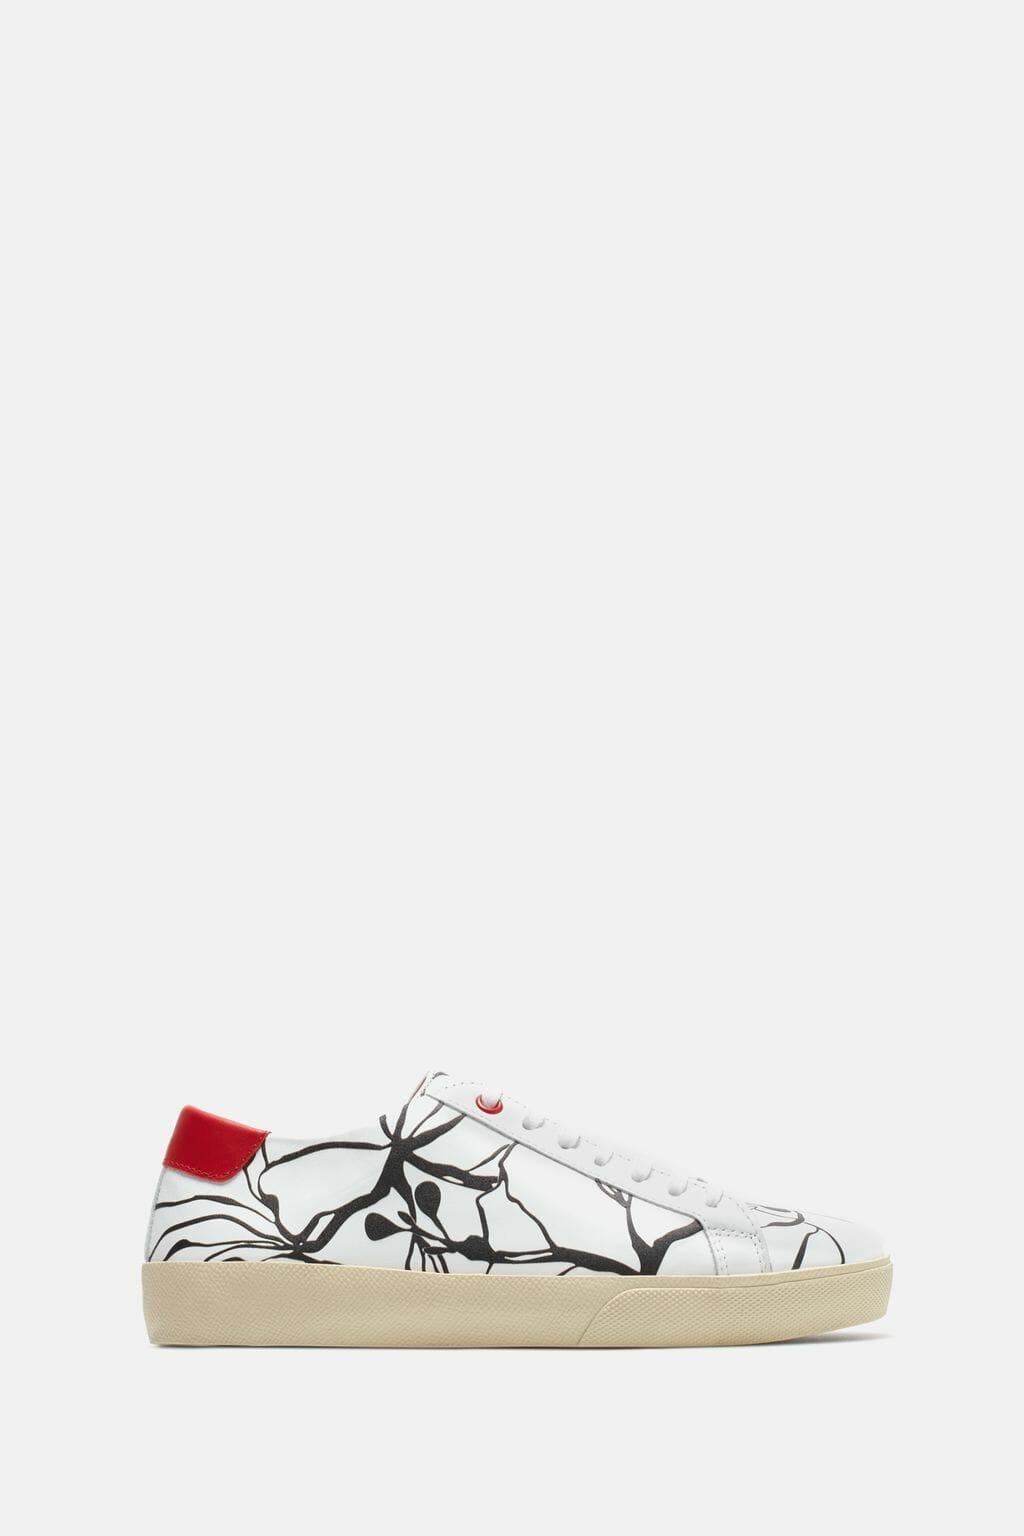 CH-Carolina-herrera-shoes-collection-Spring-Summer-2018-shoe-53